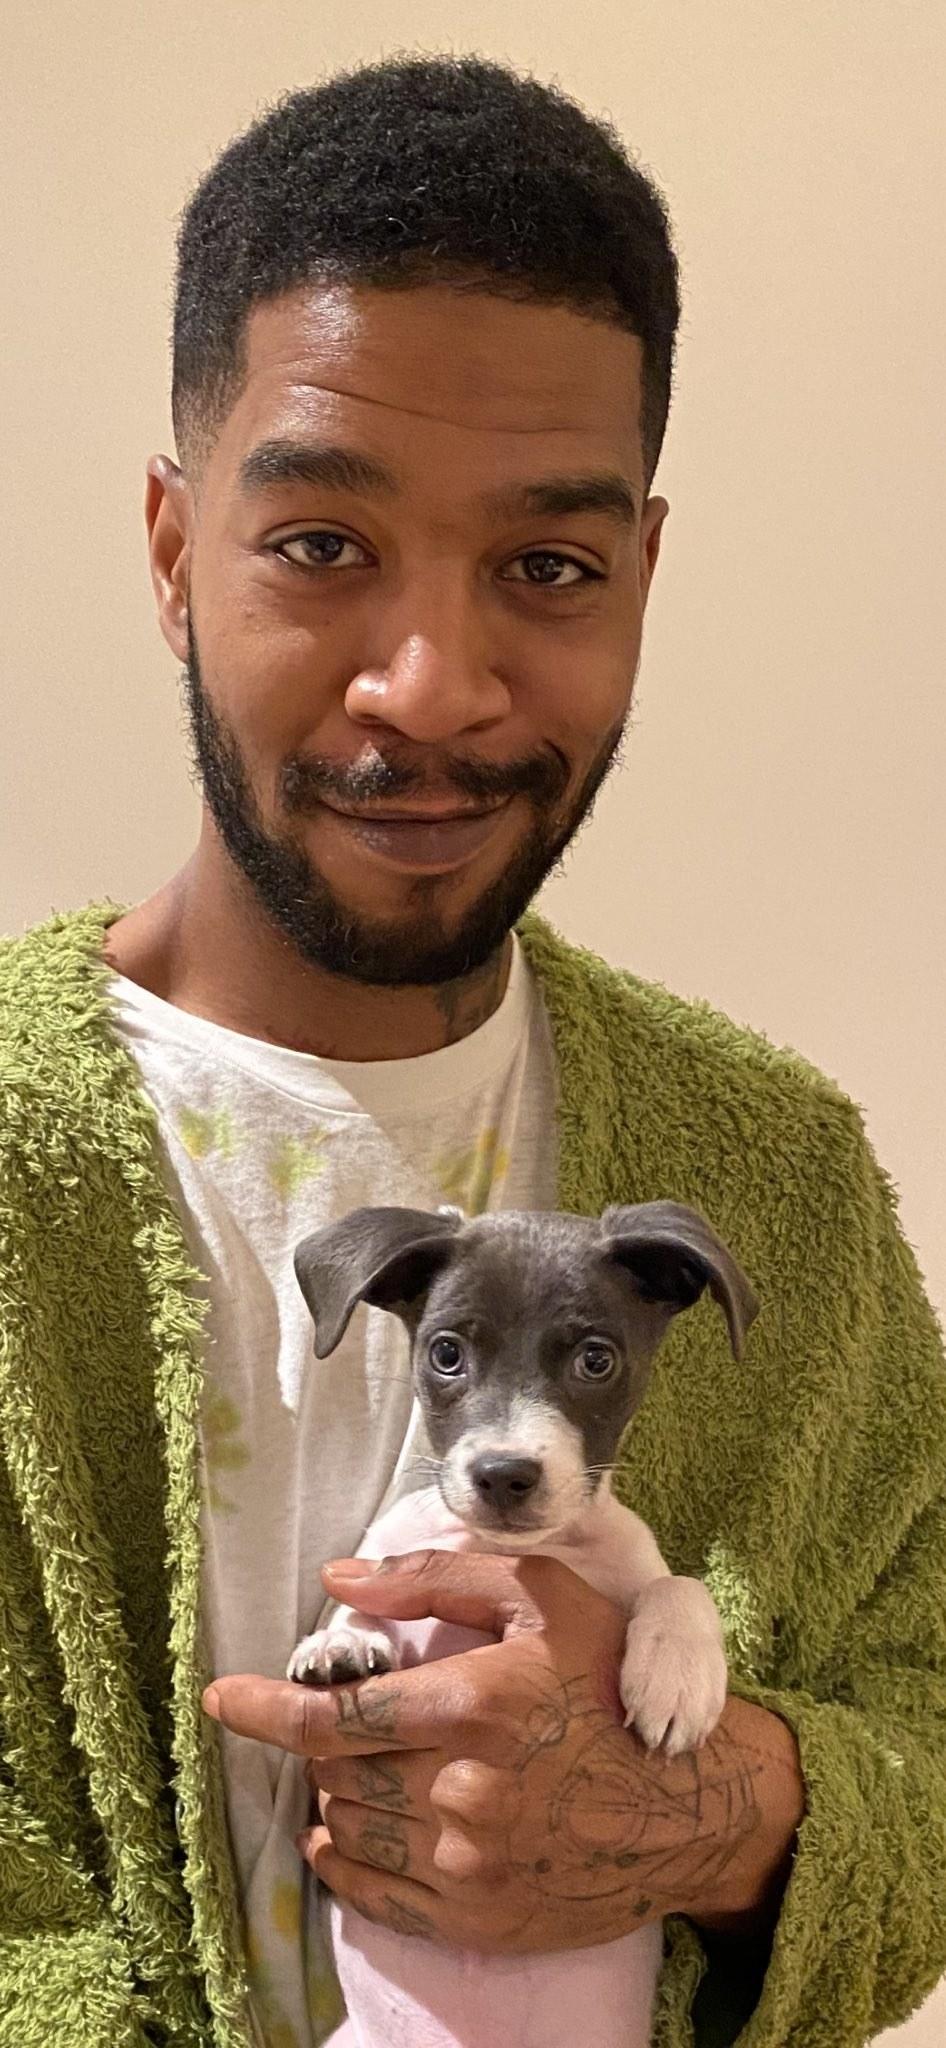 Kid Cudi and his dog